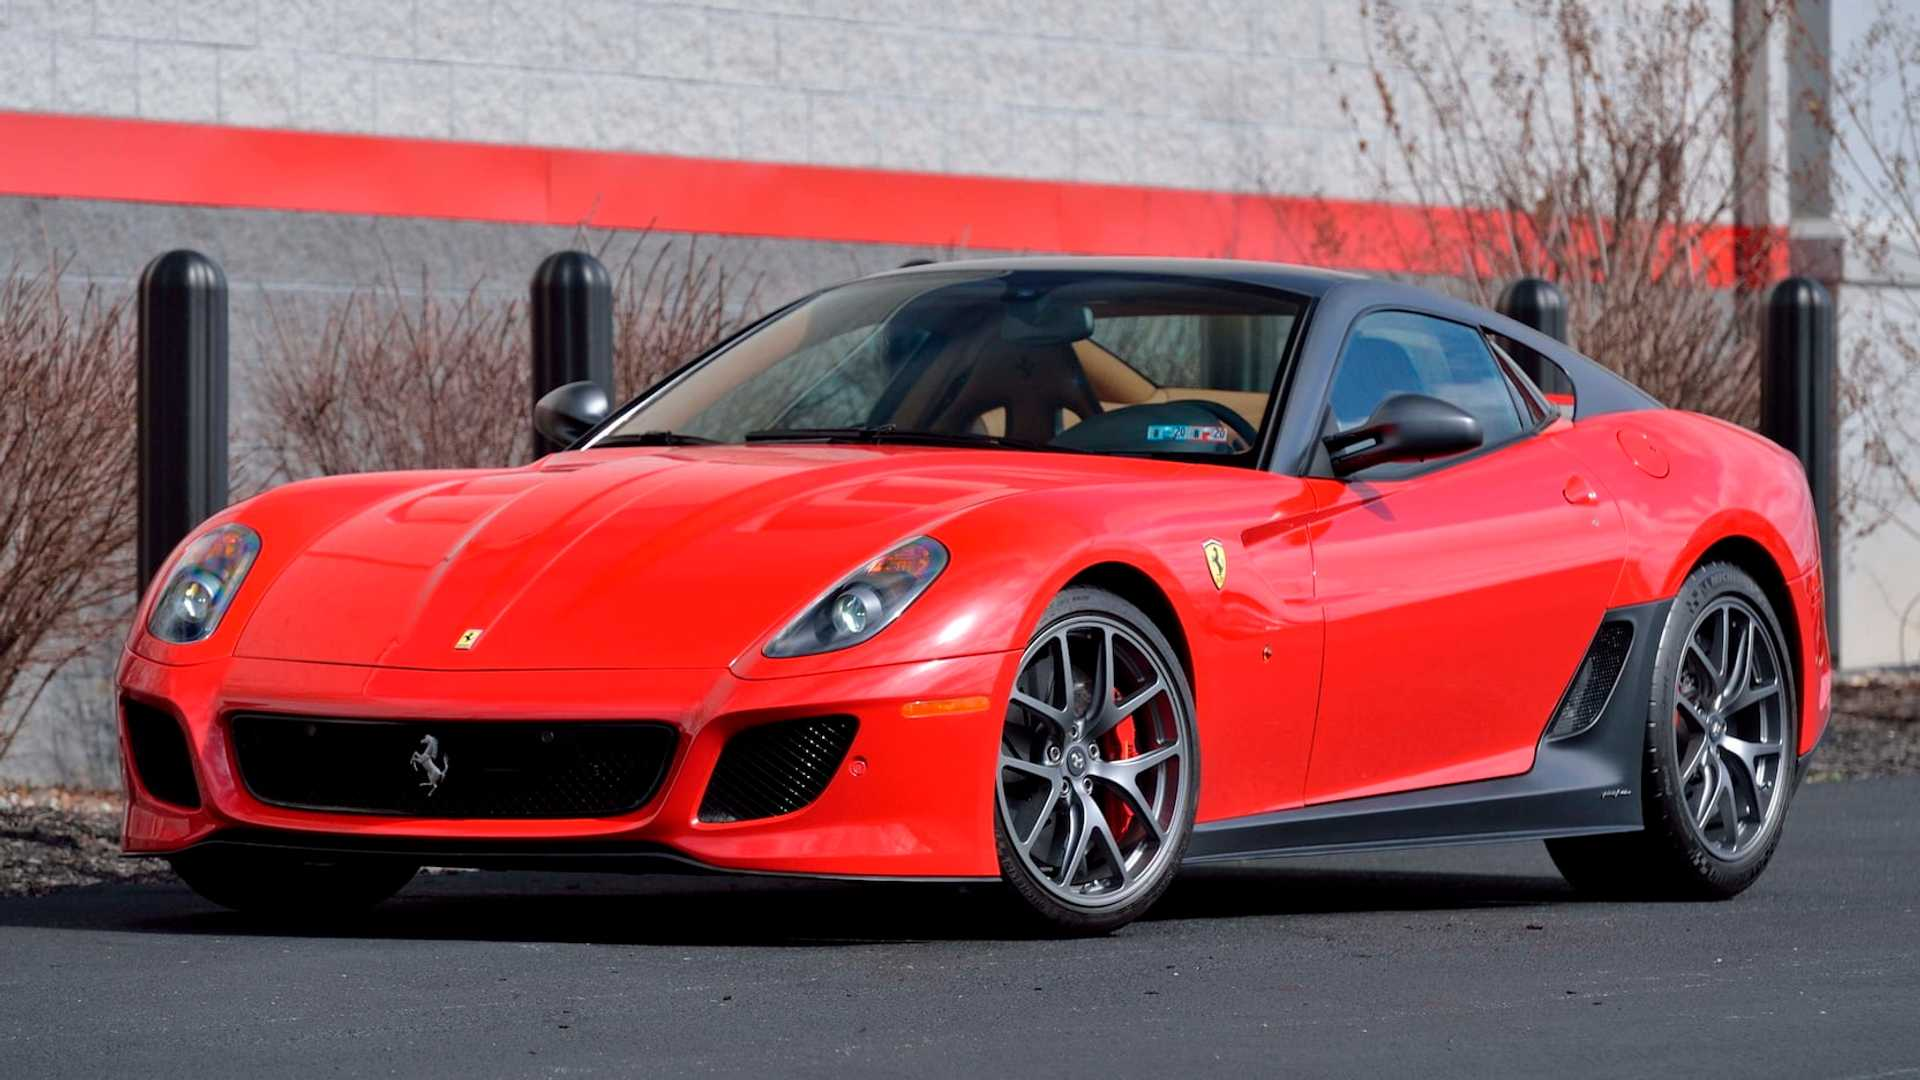 2011_Ferrari_599_GTO_auction_0001